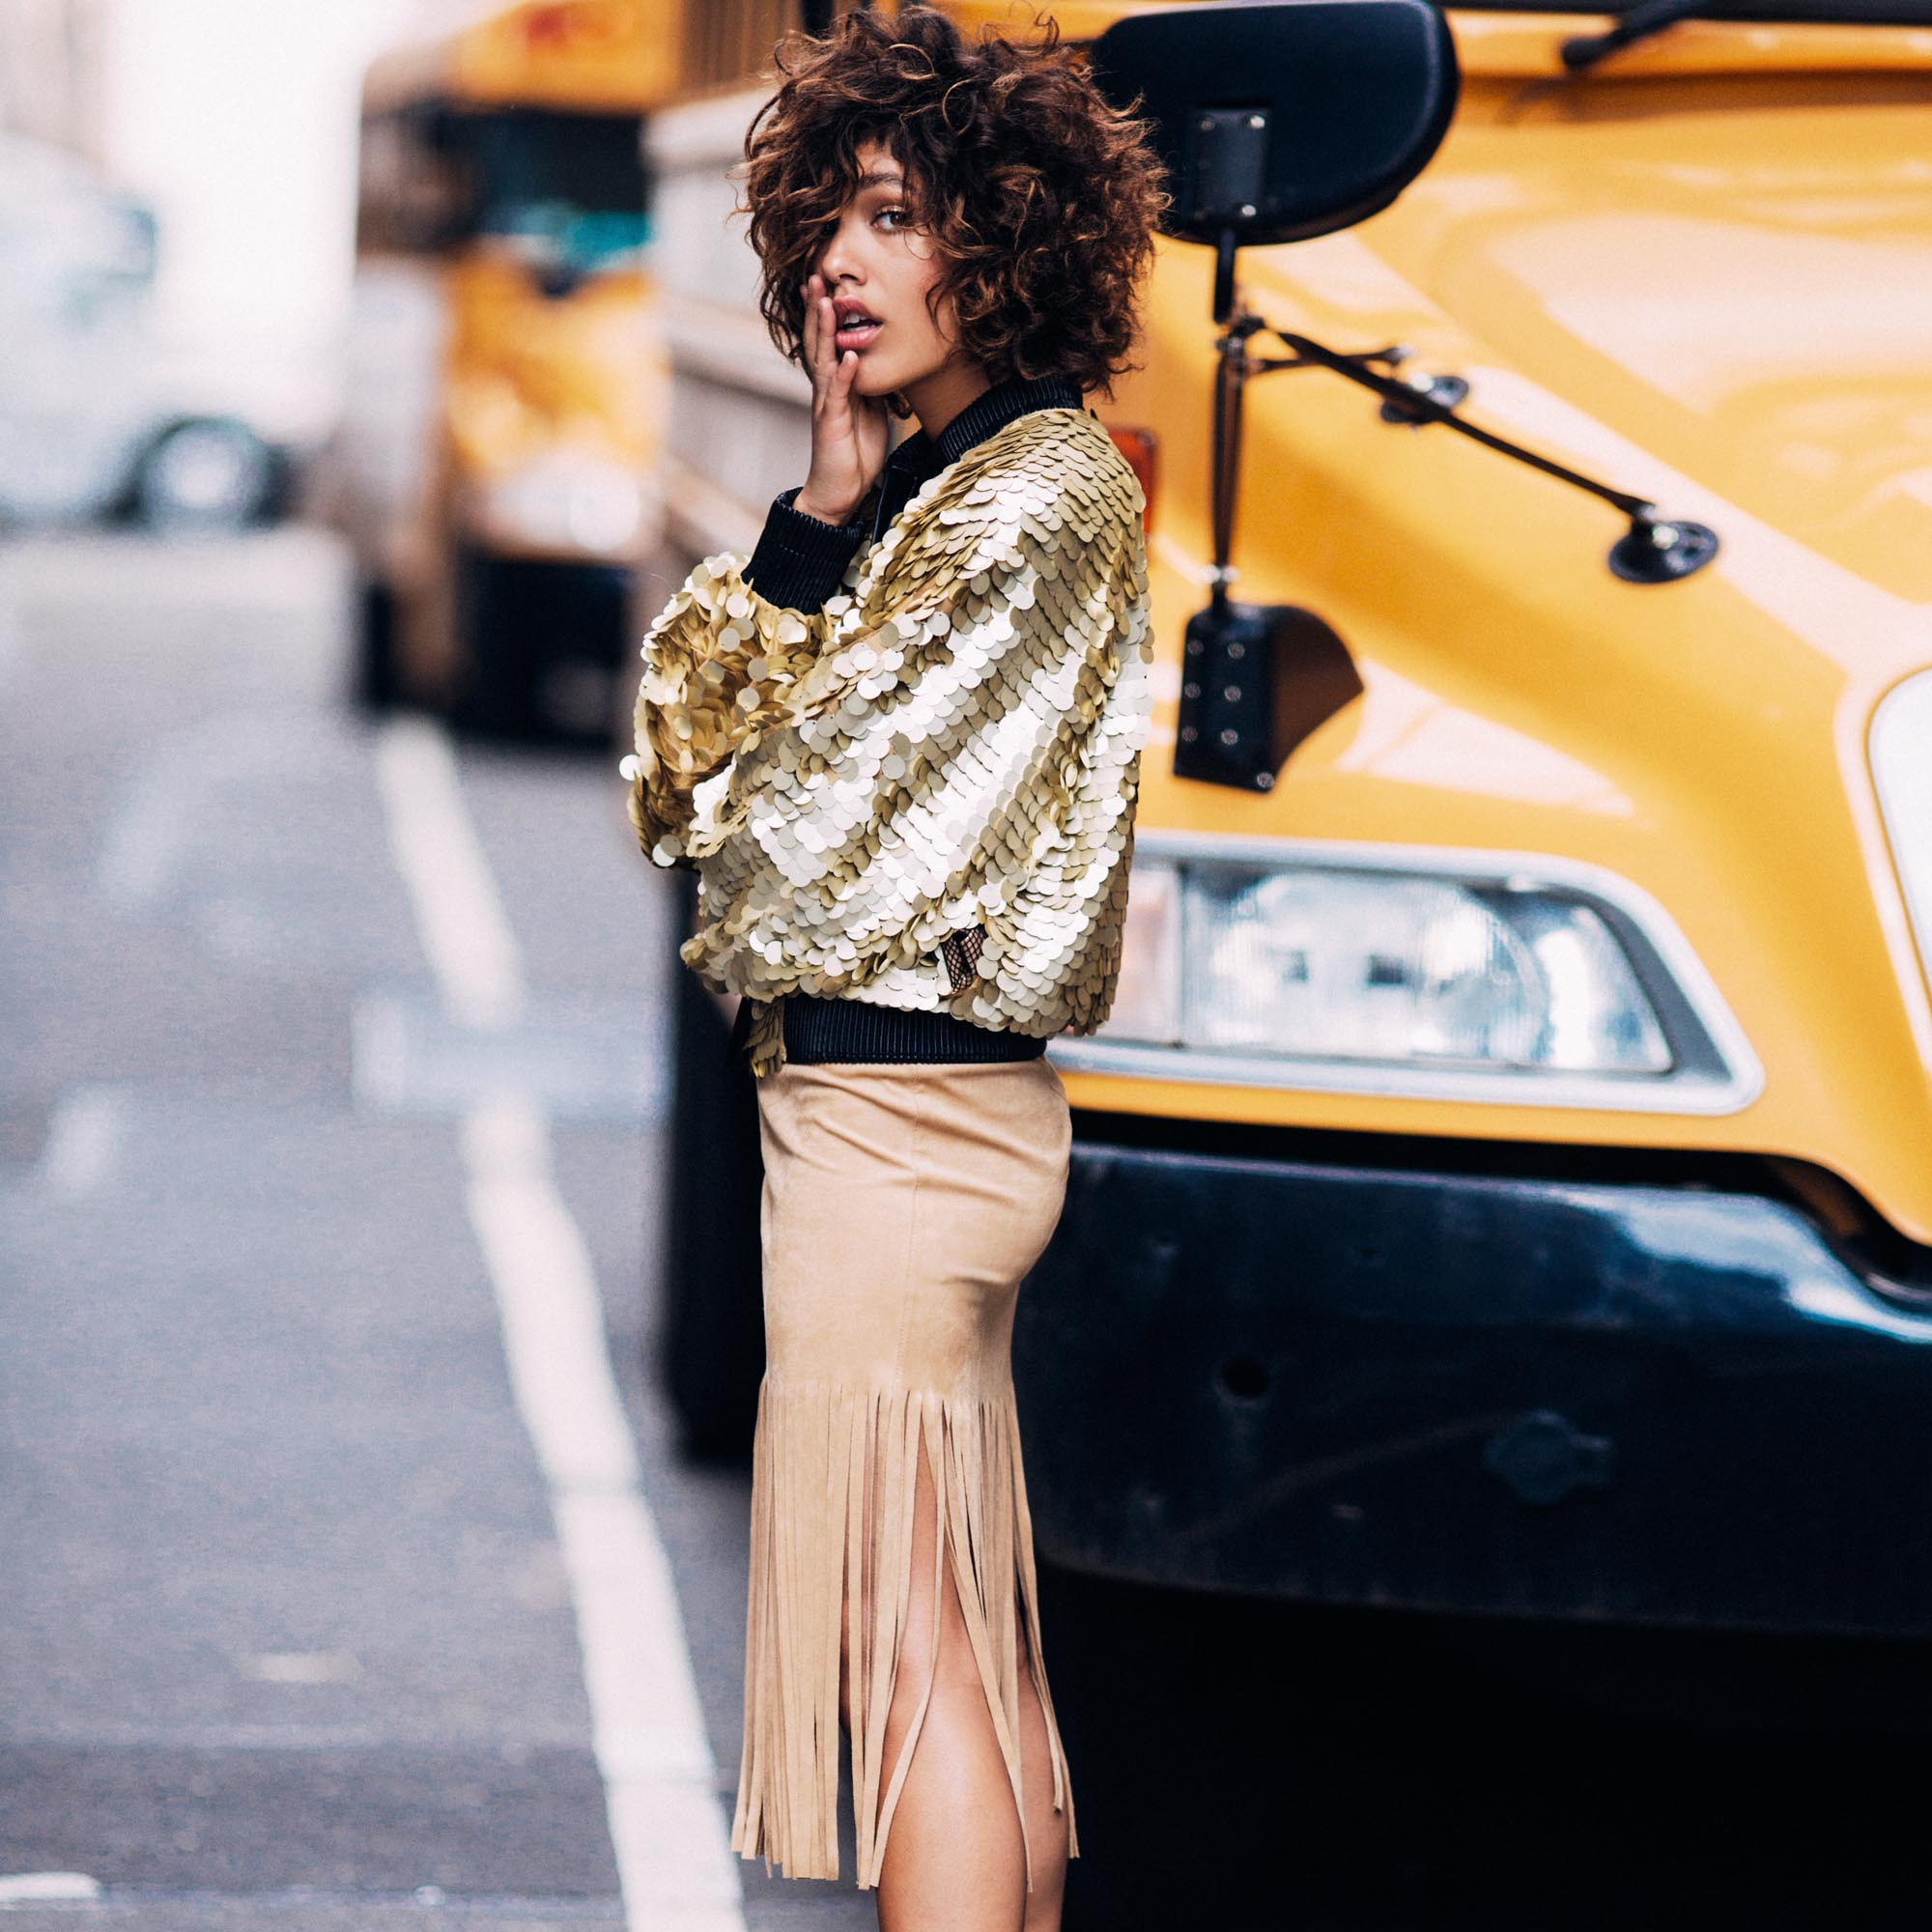 nyc-photographers-NYC-Tour-PHOTOSHOOT-10006.jpg